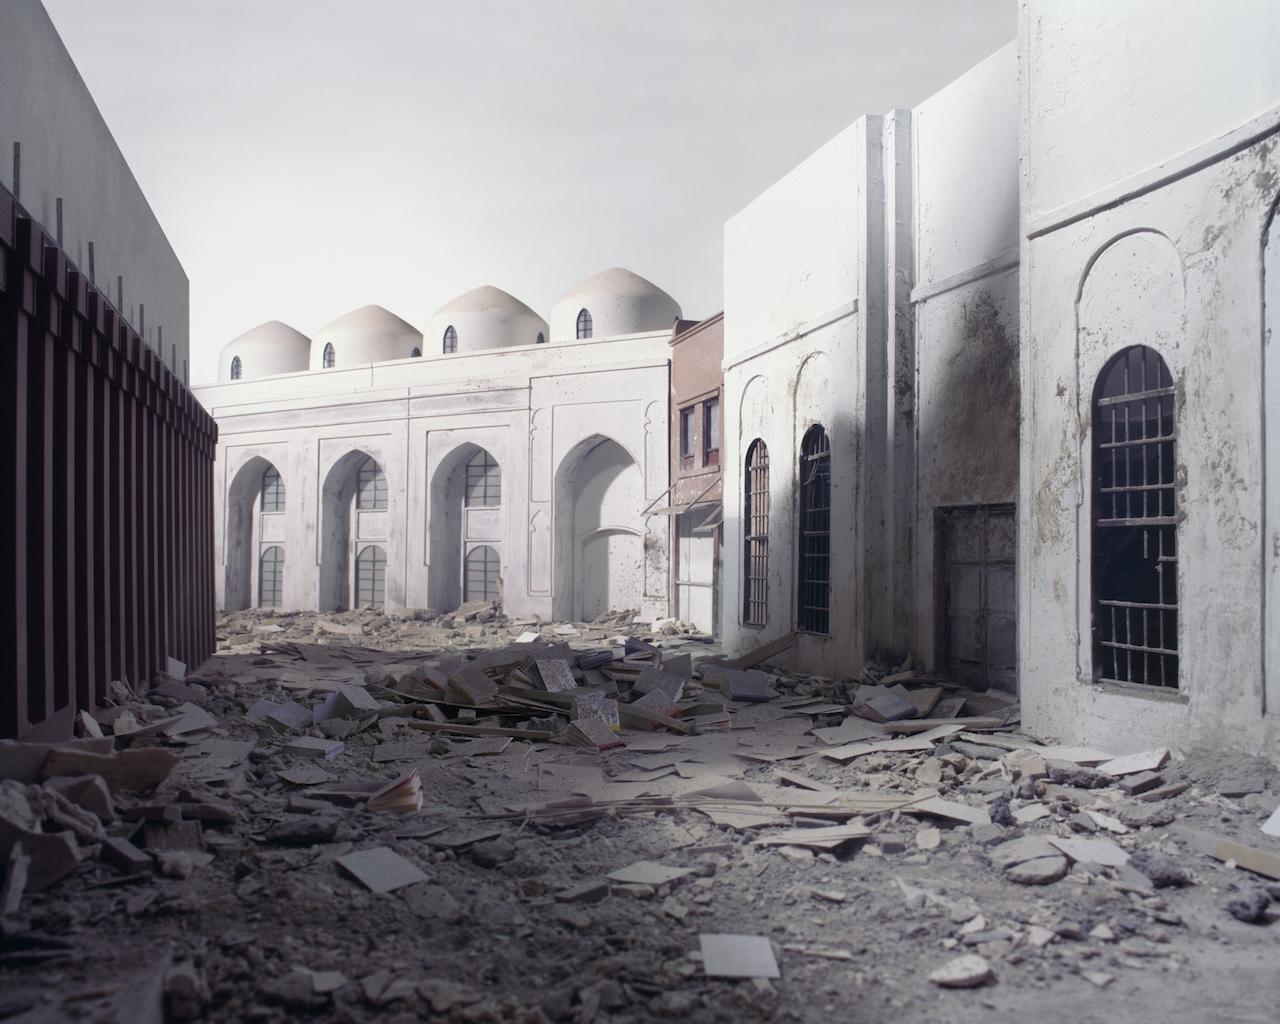 Wafaa Bilal_168-01_The Ashes Series_Al-Mutanabbi Street_Wafaa Bilal